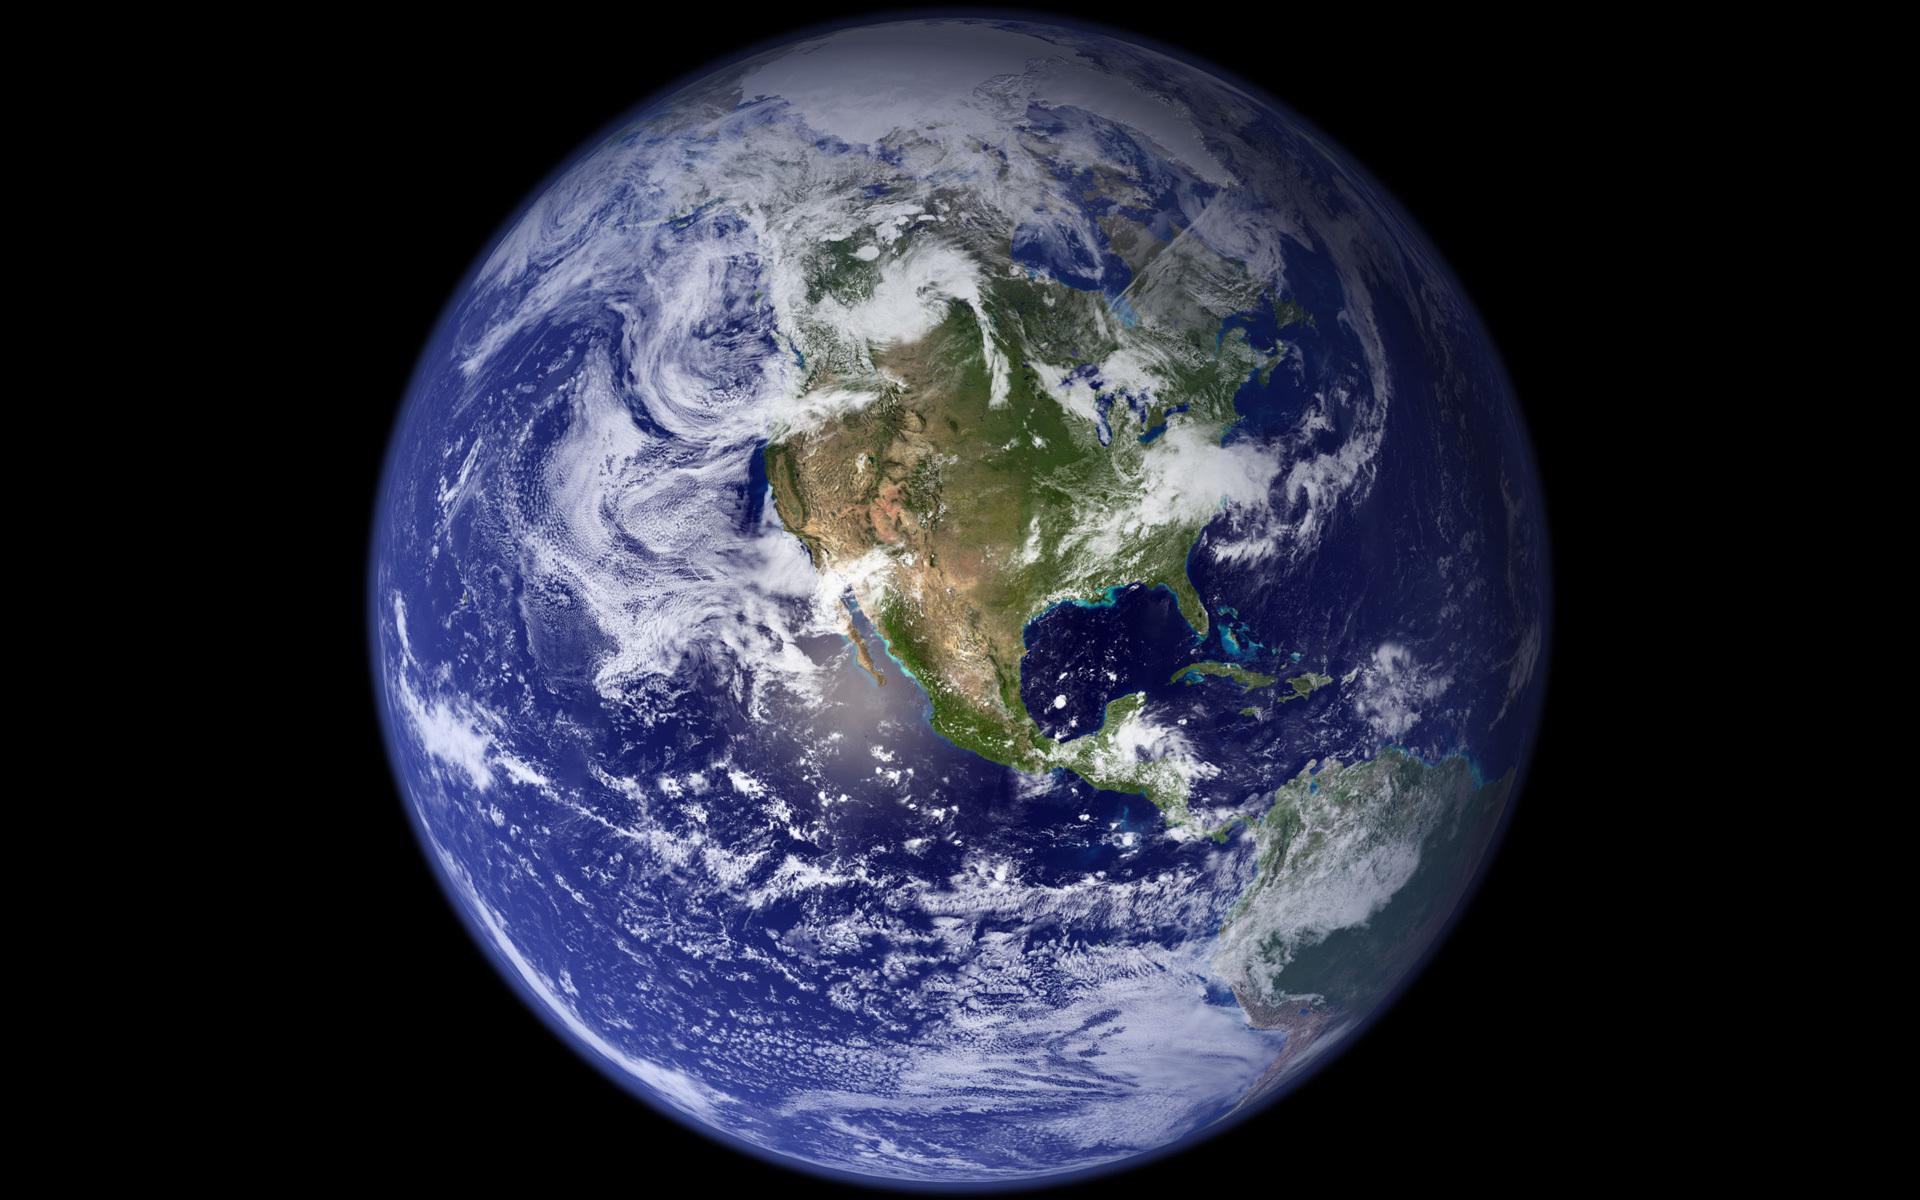 「地球 画像」の画像検索結果